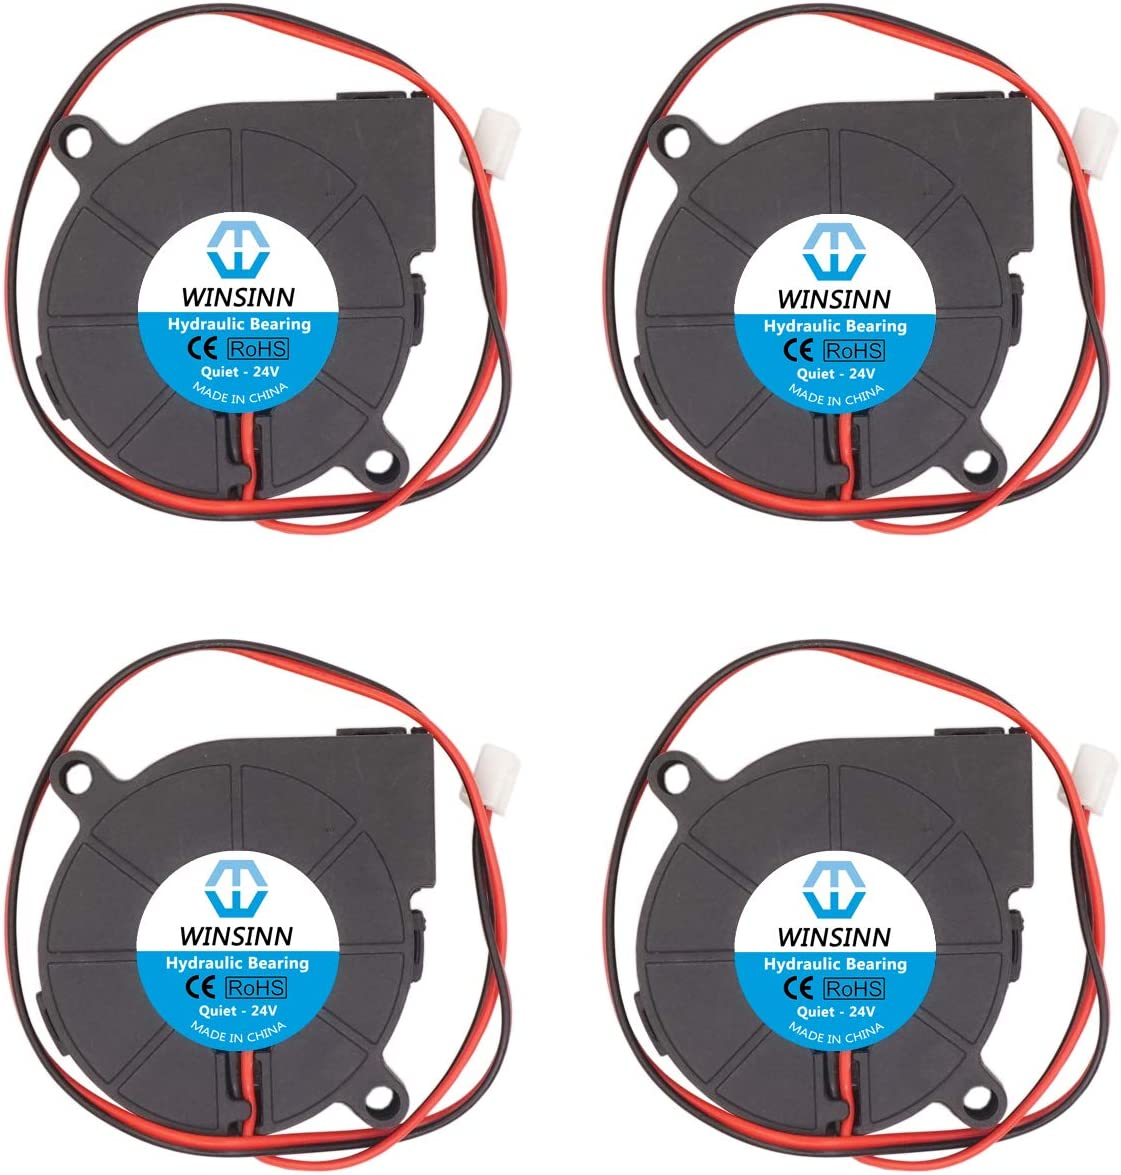 WINSINN 50mm Blower Fan 24V 5015 50x15mm Turbine Turbo Brushless for PC CPU - Quiet (Pack of 4Pcs)